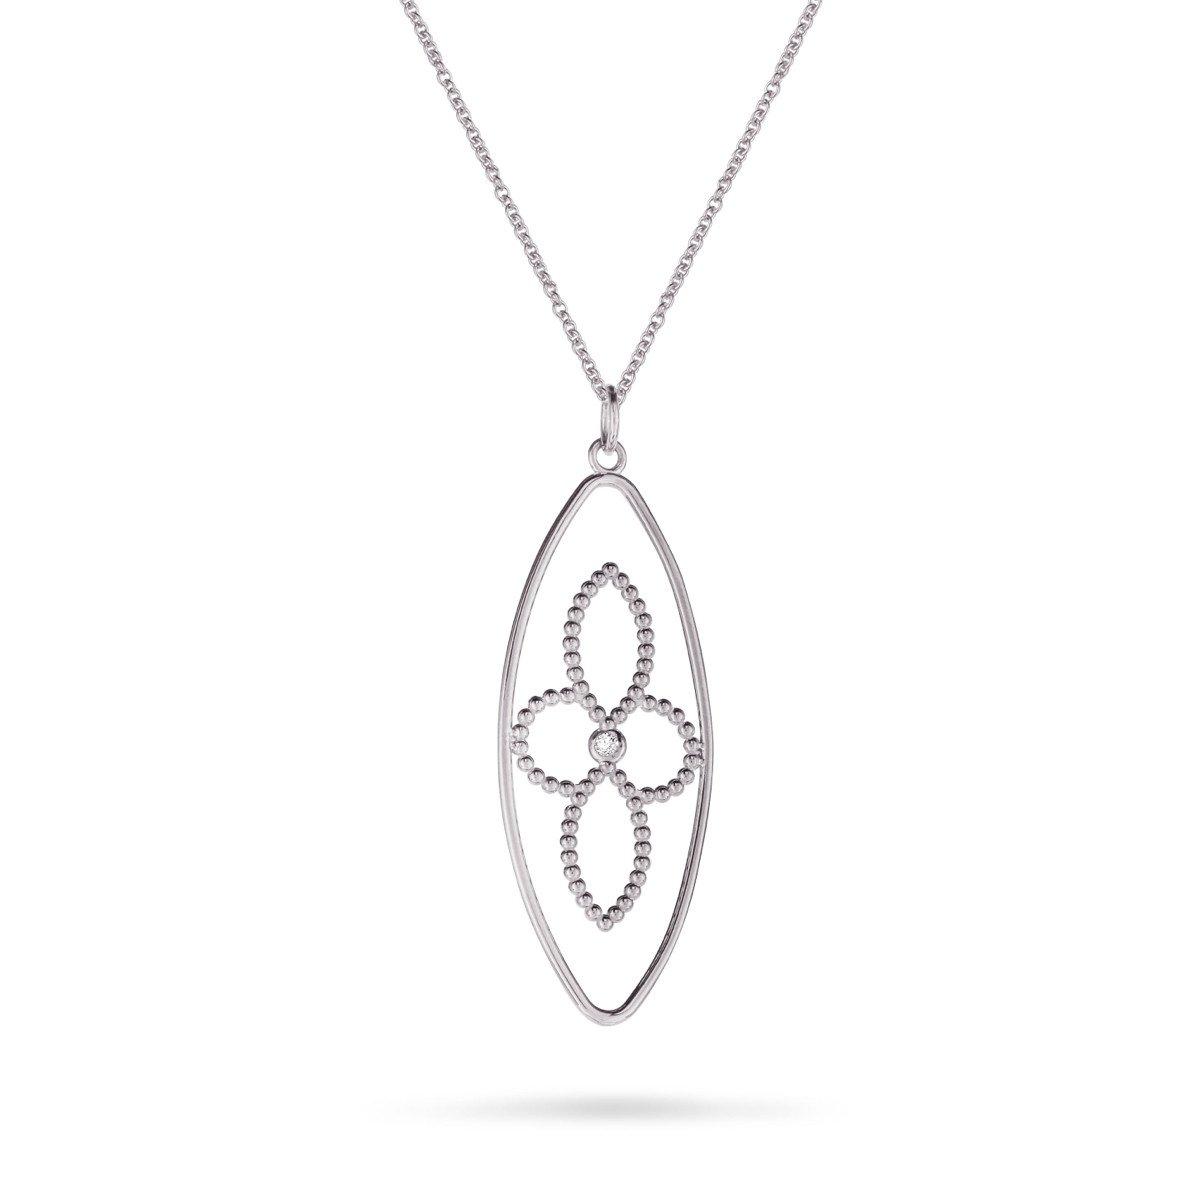 4 Petal Flower Necklace   Products In 2019   Flower Necklace, Flower Regarding Most Recent Four Petal Flower Necklaces (View 5 of 25)